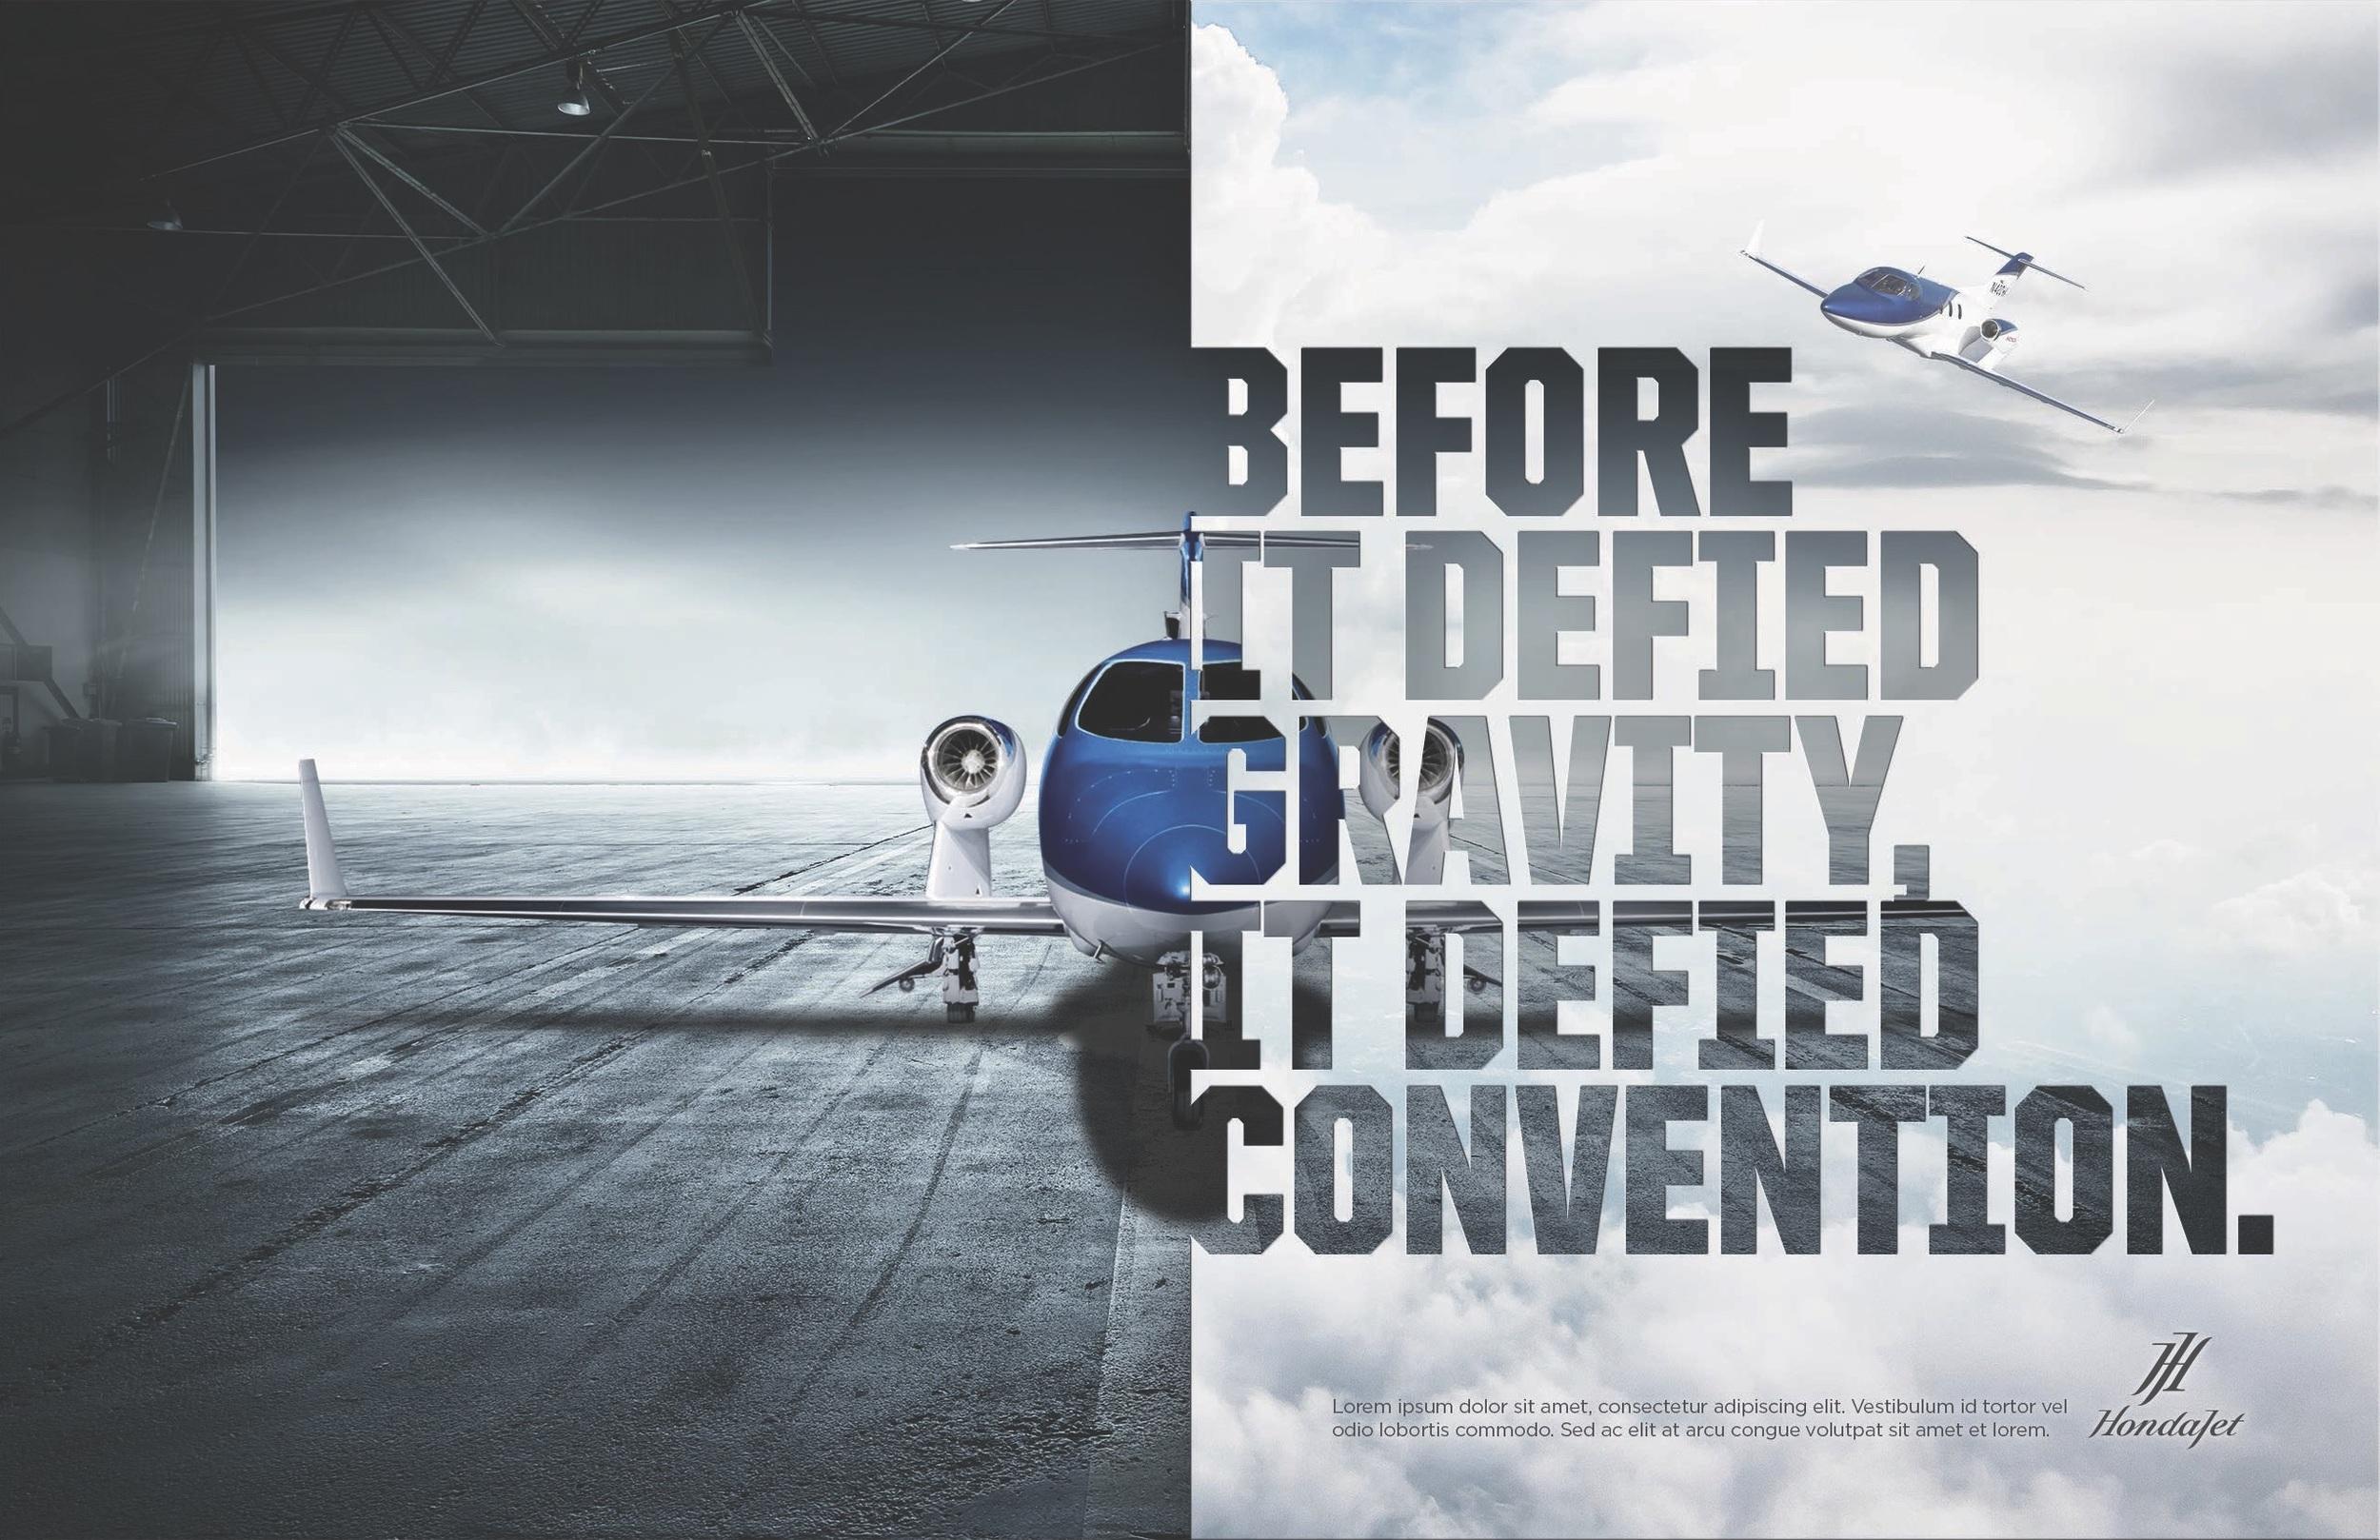 HondaJet_Convention.jpg